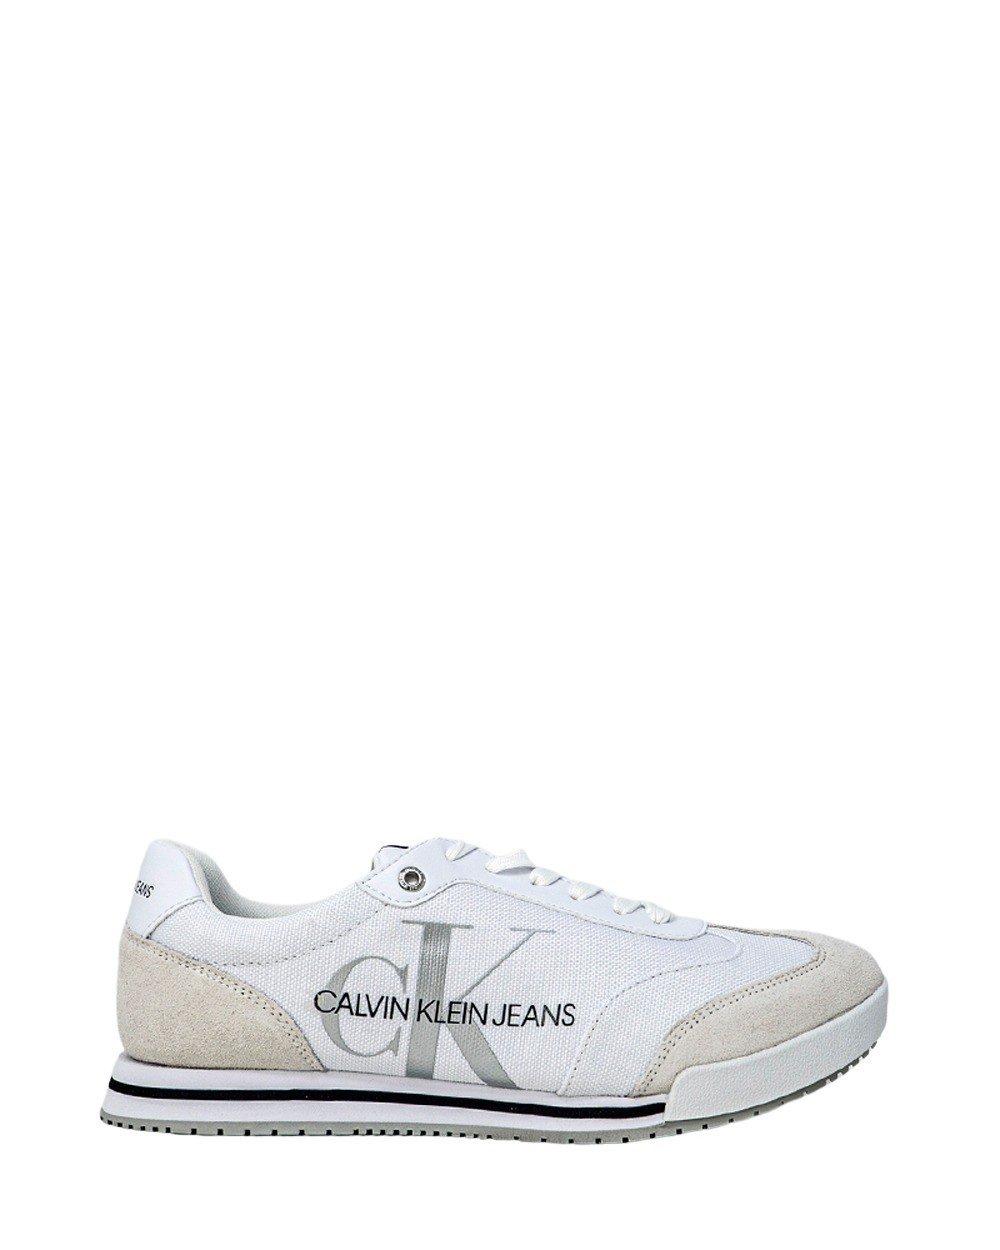 Calvin Klein Jeans Men's Trainer Various Colours 249009 - white 44